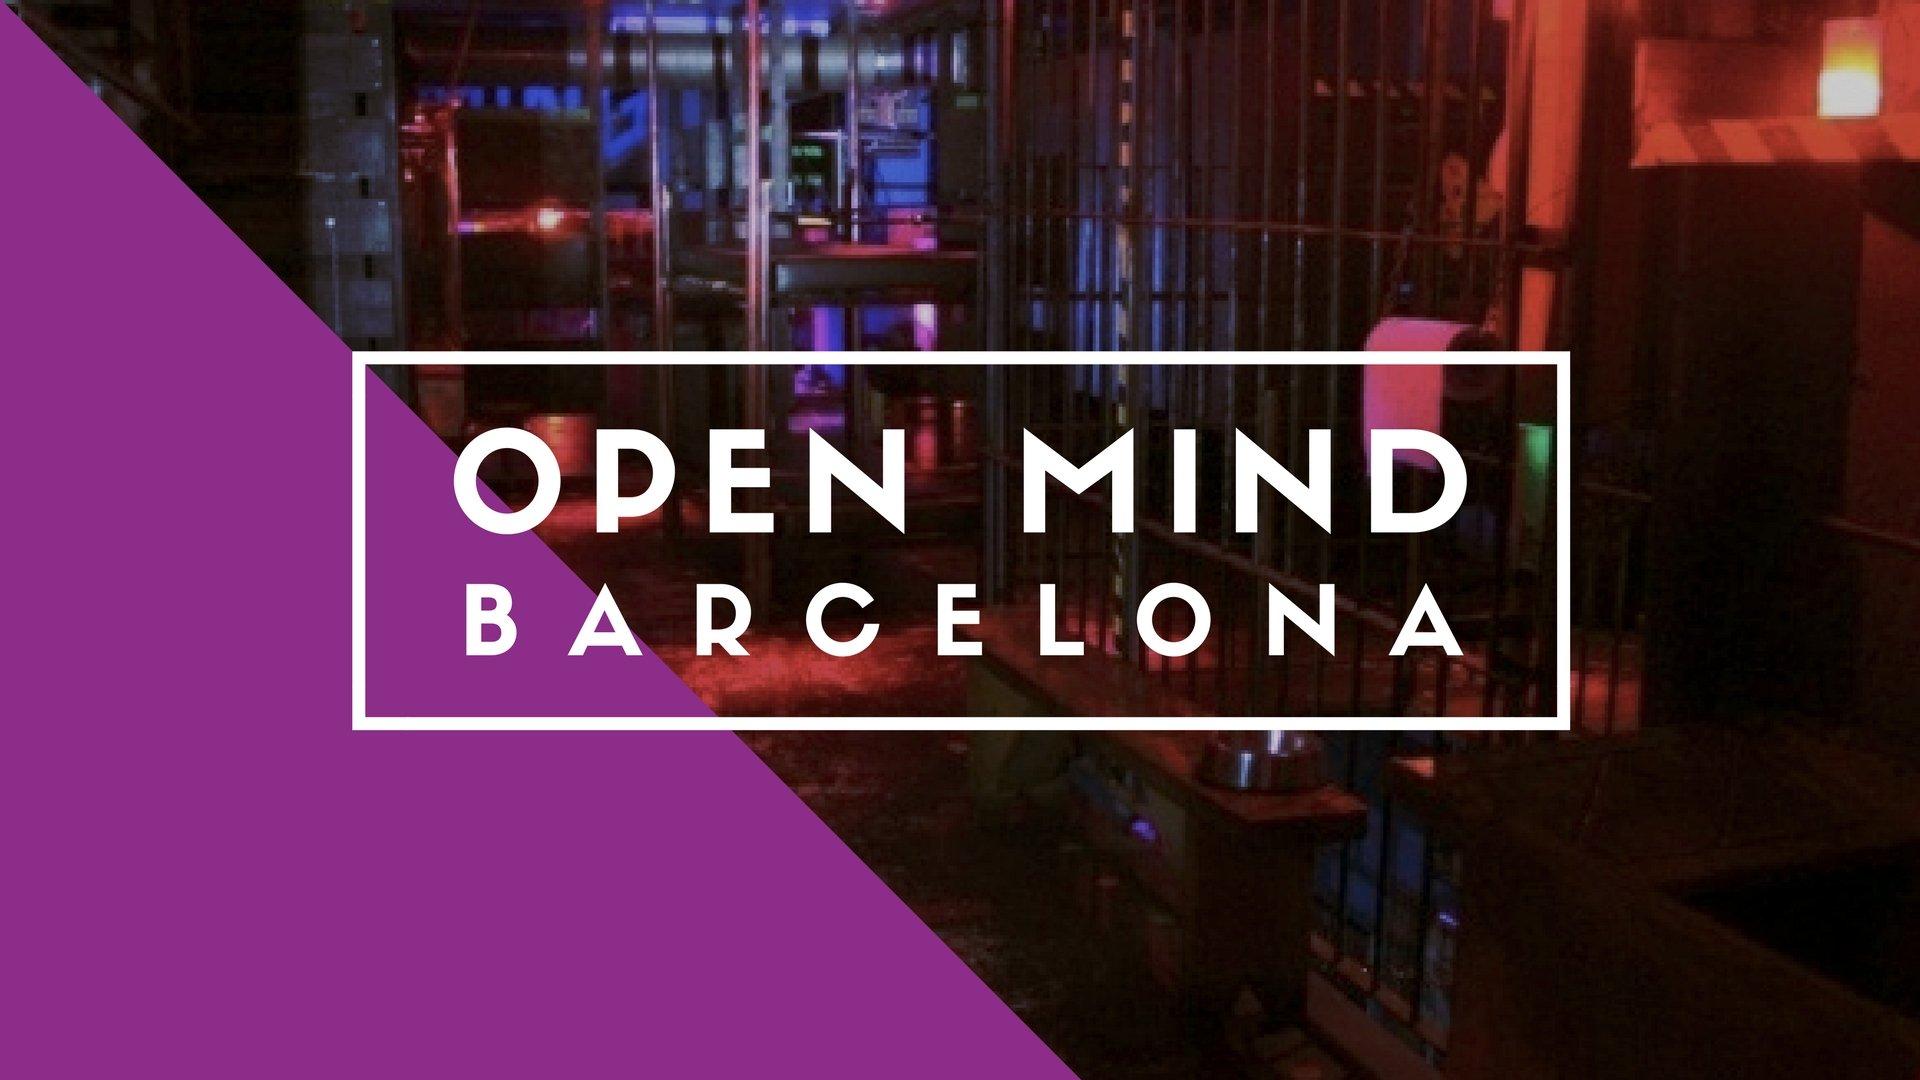 Open Mind, Barcelona